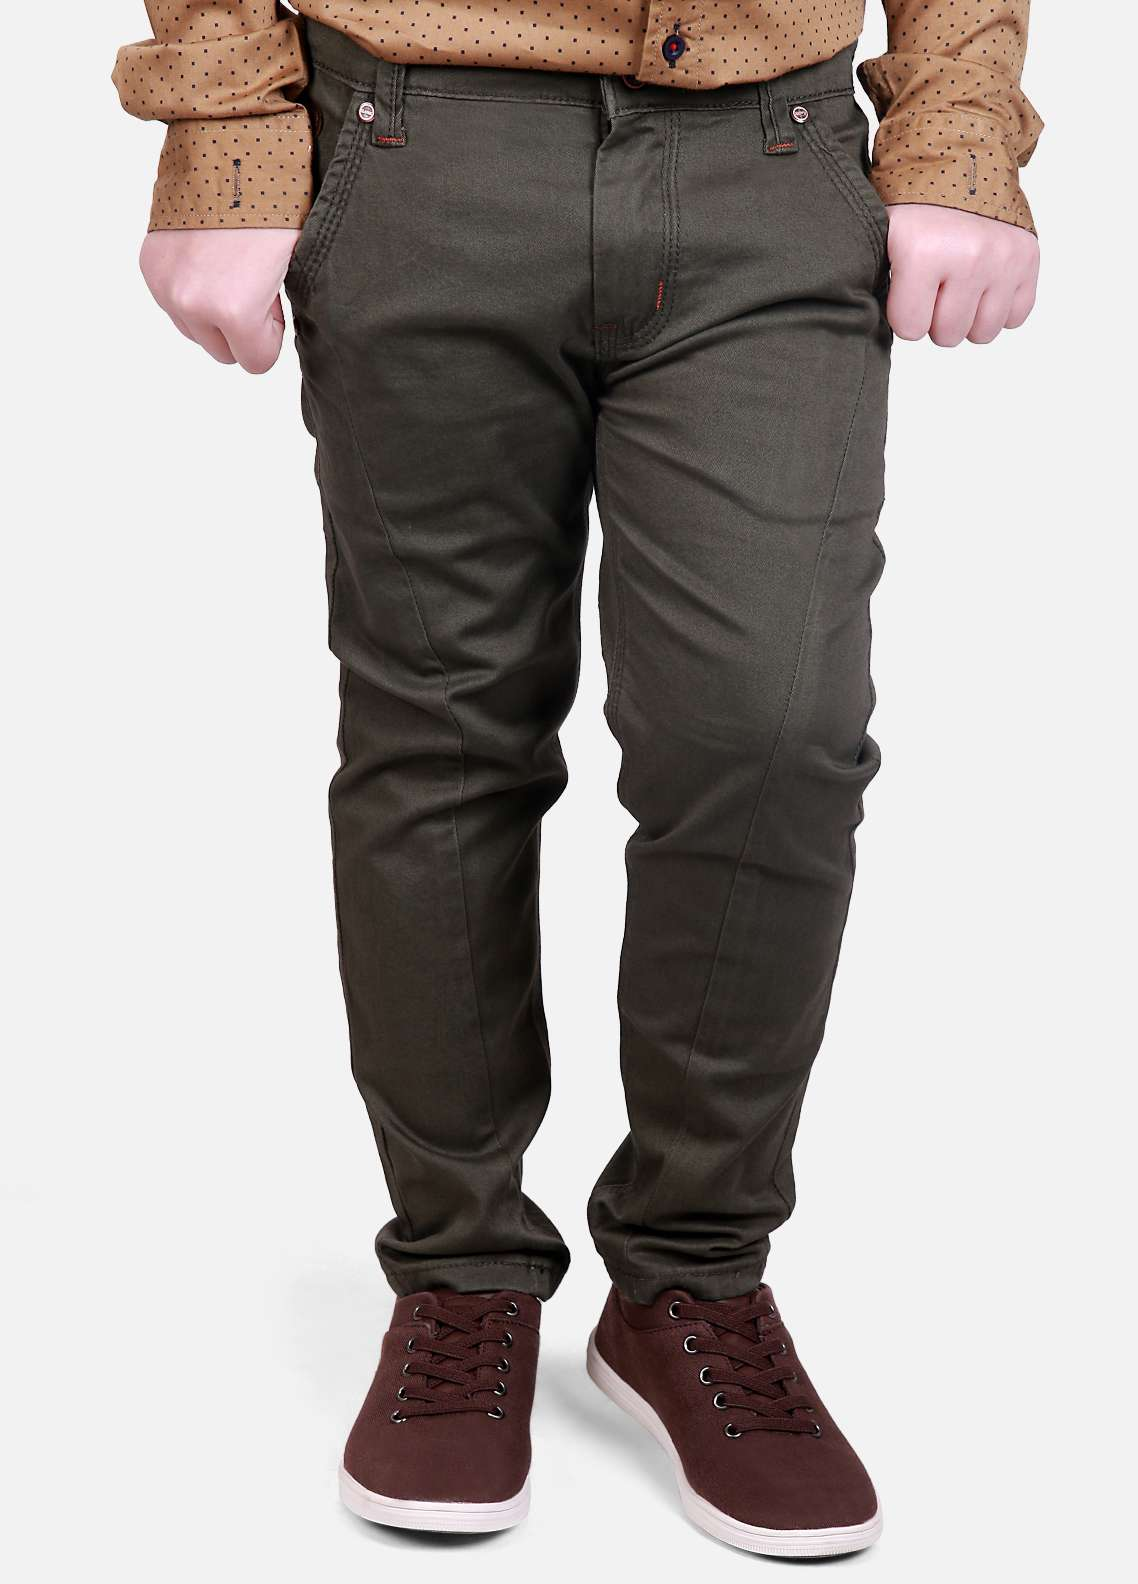 Edenrobe Cotton Plain Texture Pants for Boys - Green EDK18P 24053